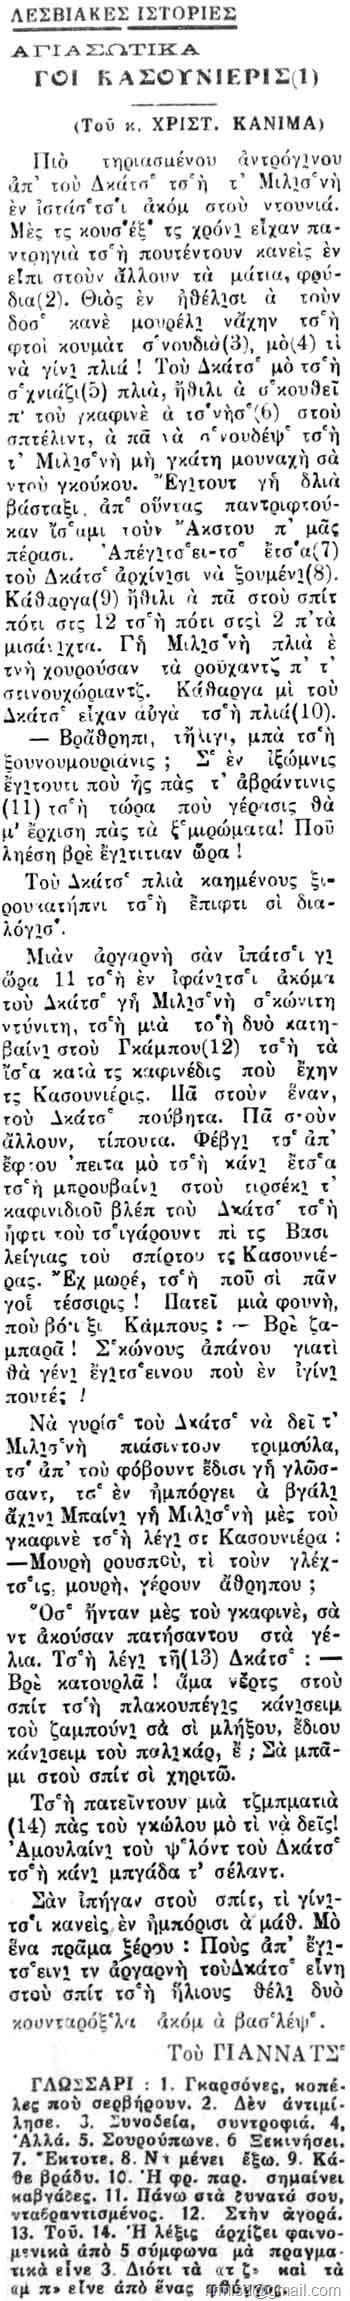 trivolos_19331117_kasounieris-ΑΓΙΑΣΟΣ,ΓΙΑΝΝΑΤΣ,ΚΑΝΙΜΑΣ,ΚΑΦΕΝΕΙΟ,ΤΡΙΒΟΛΟΣ